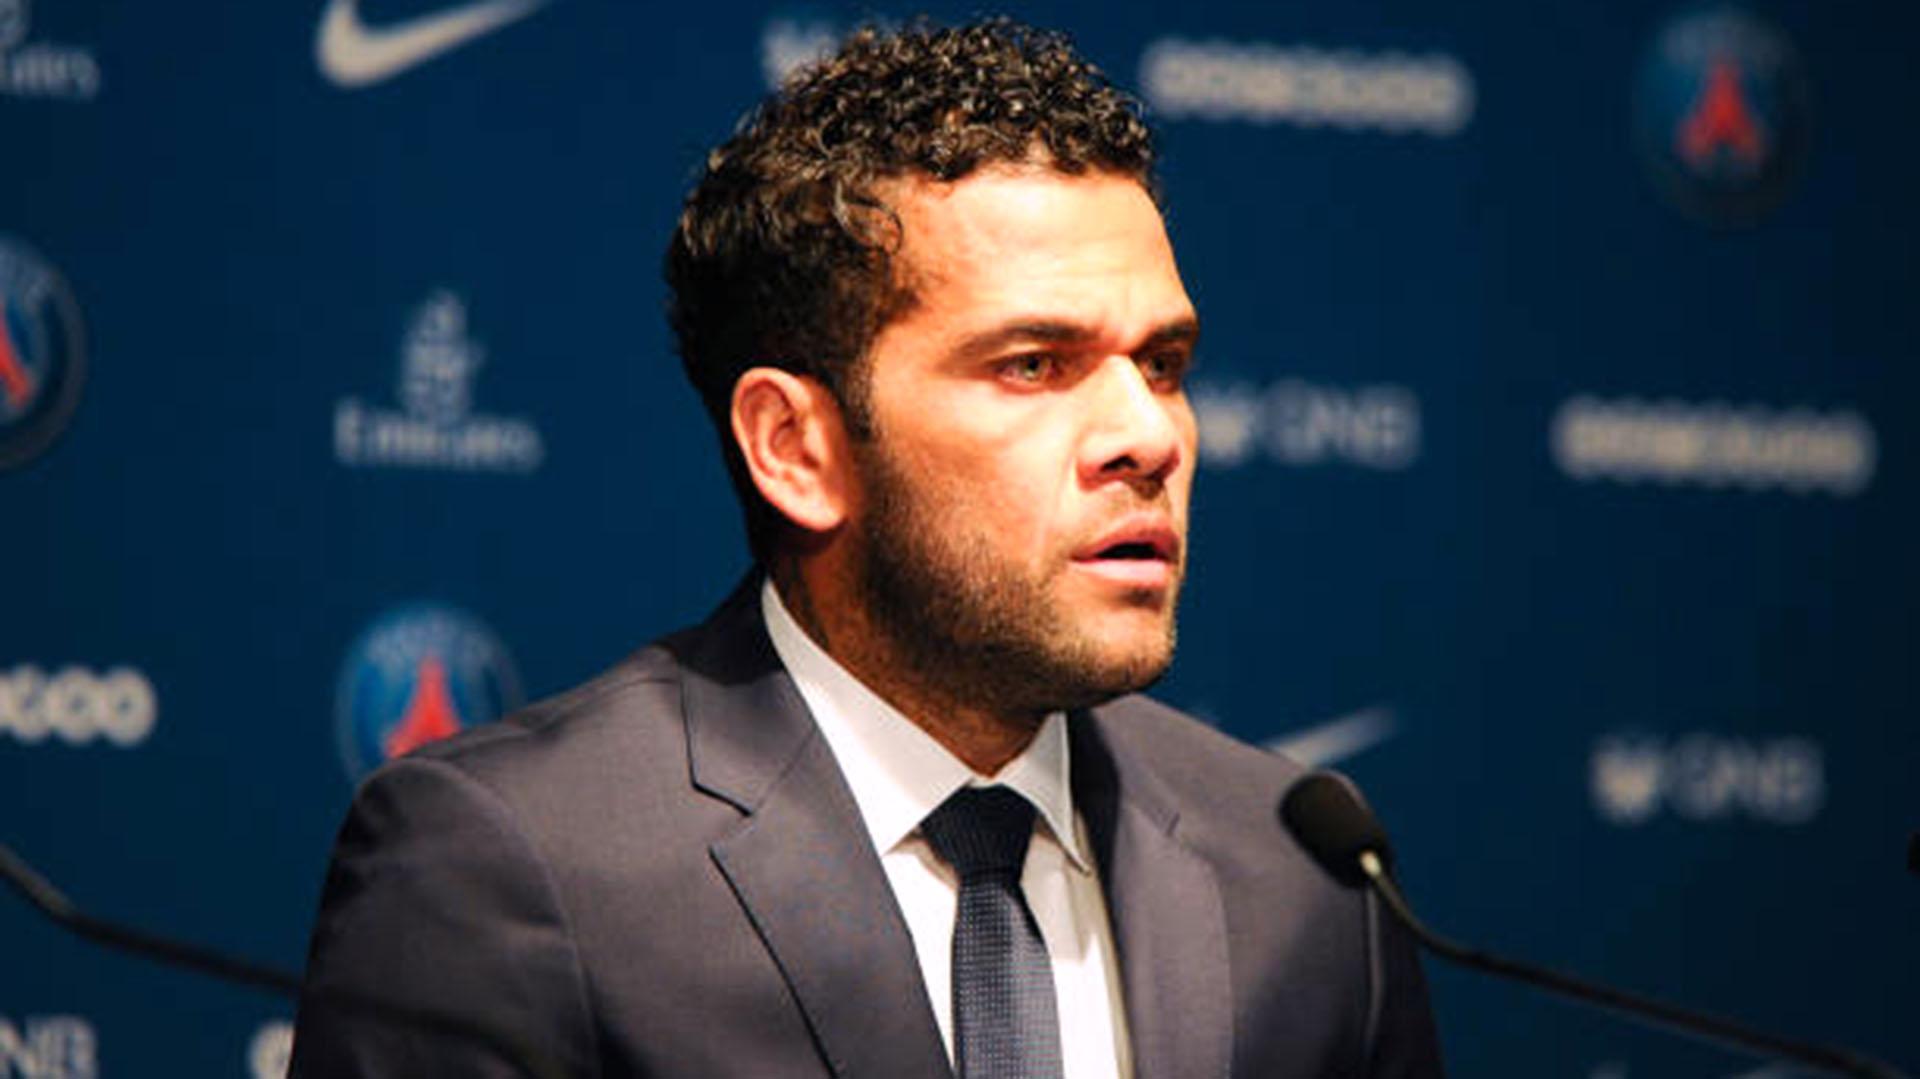 (AFP) Dani Alves culpó a la intermitencia del equipo como el factor de la derrota